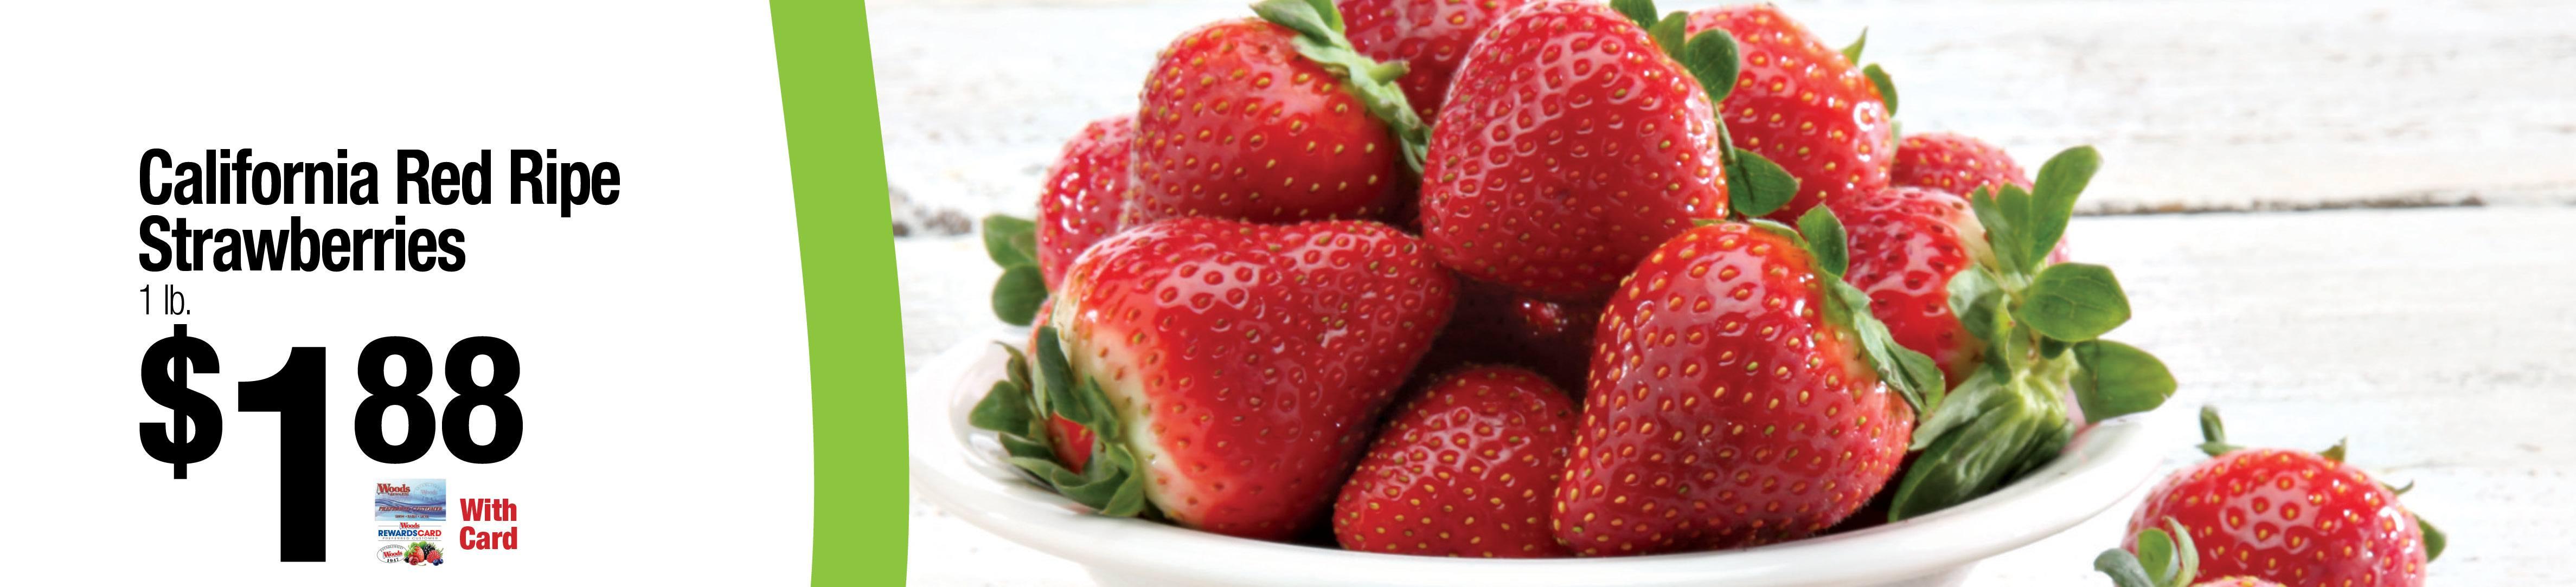 California Red Ripe Strawberries $1.88lb